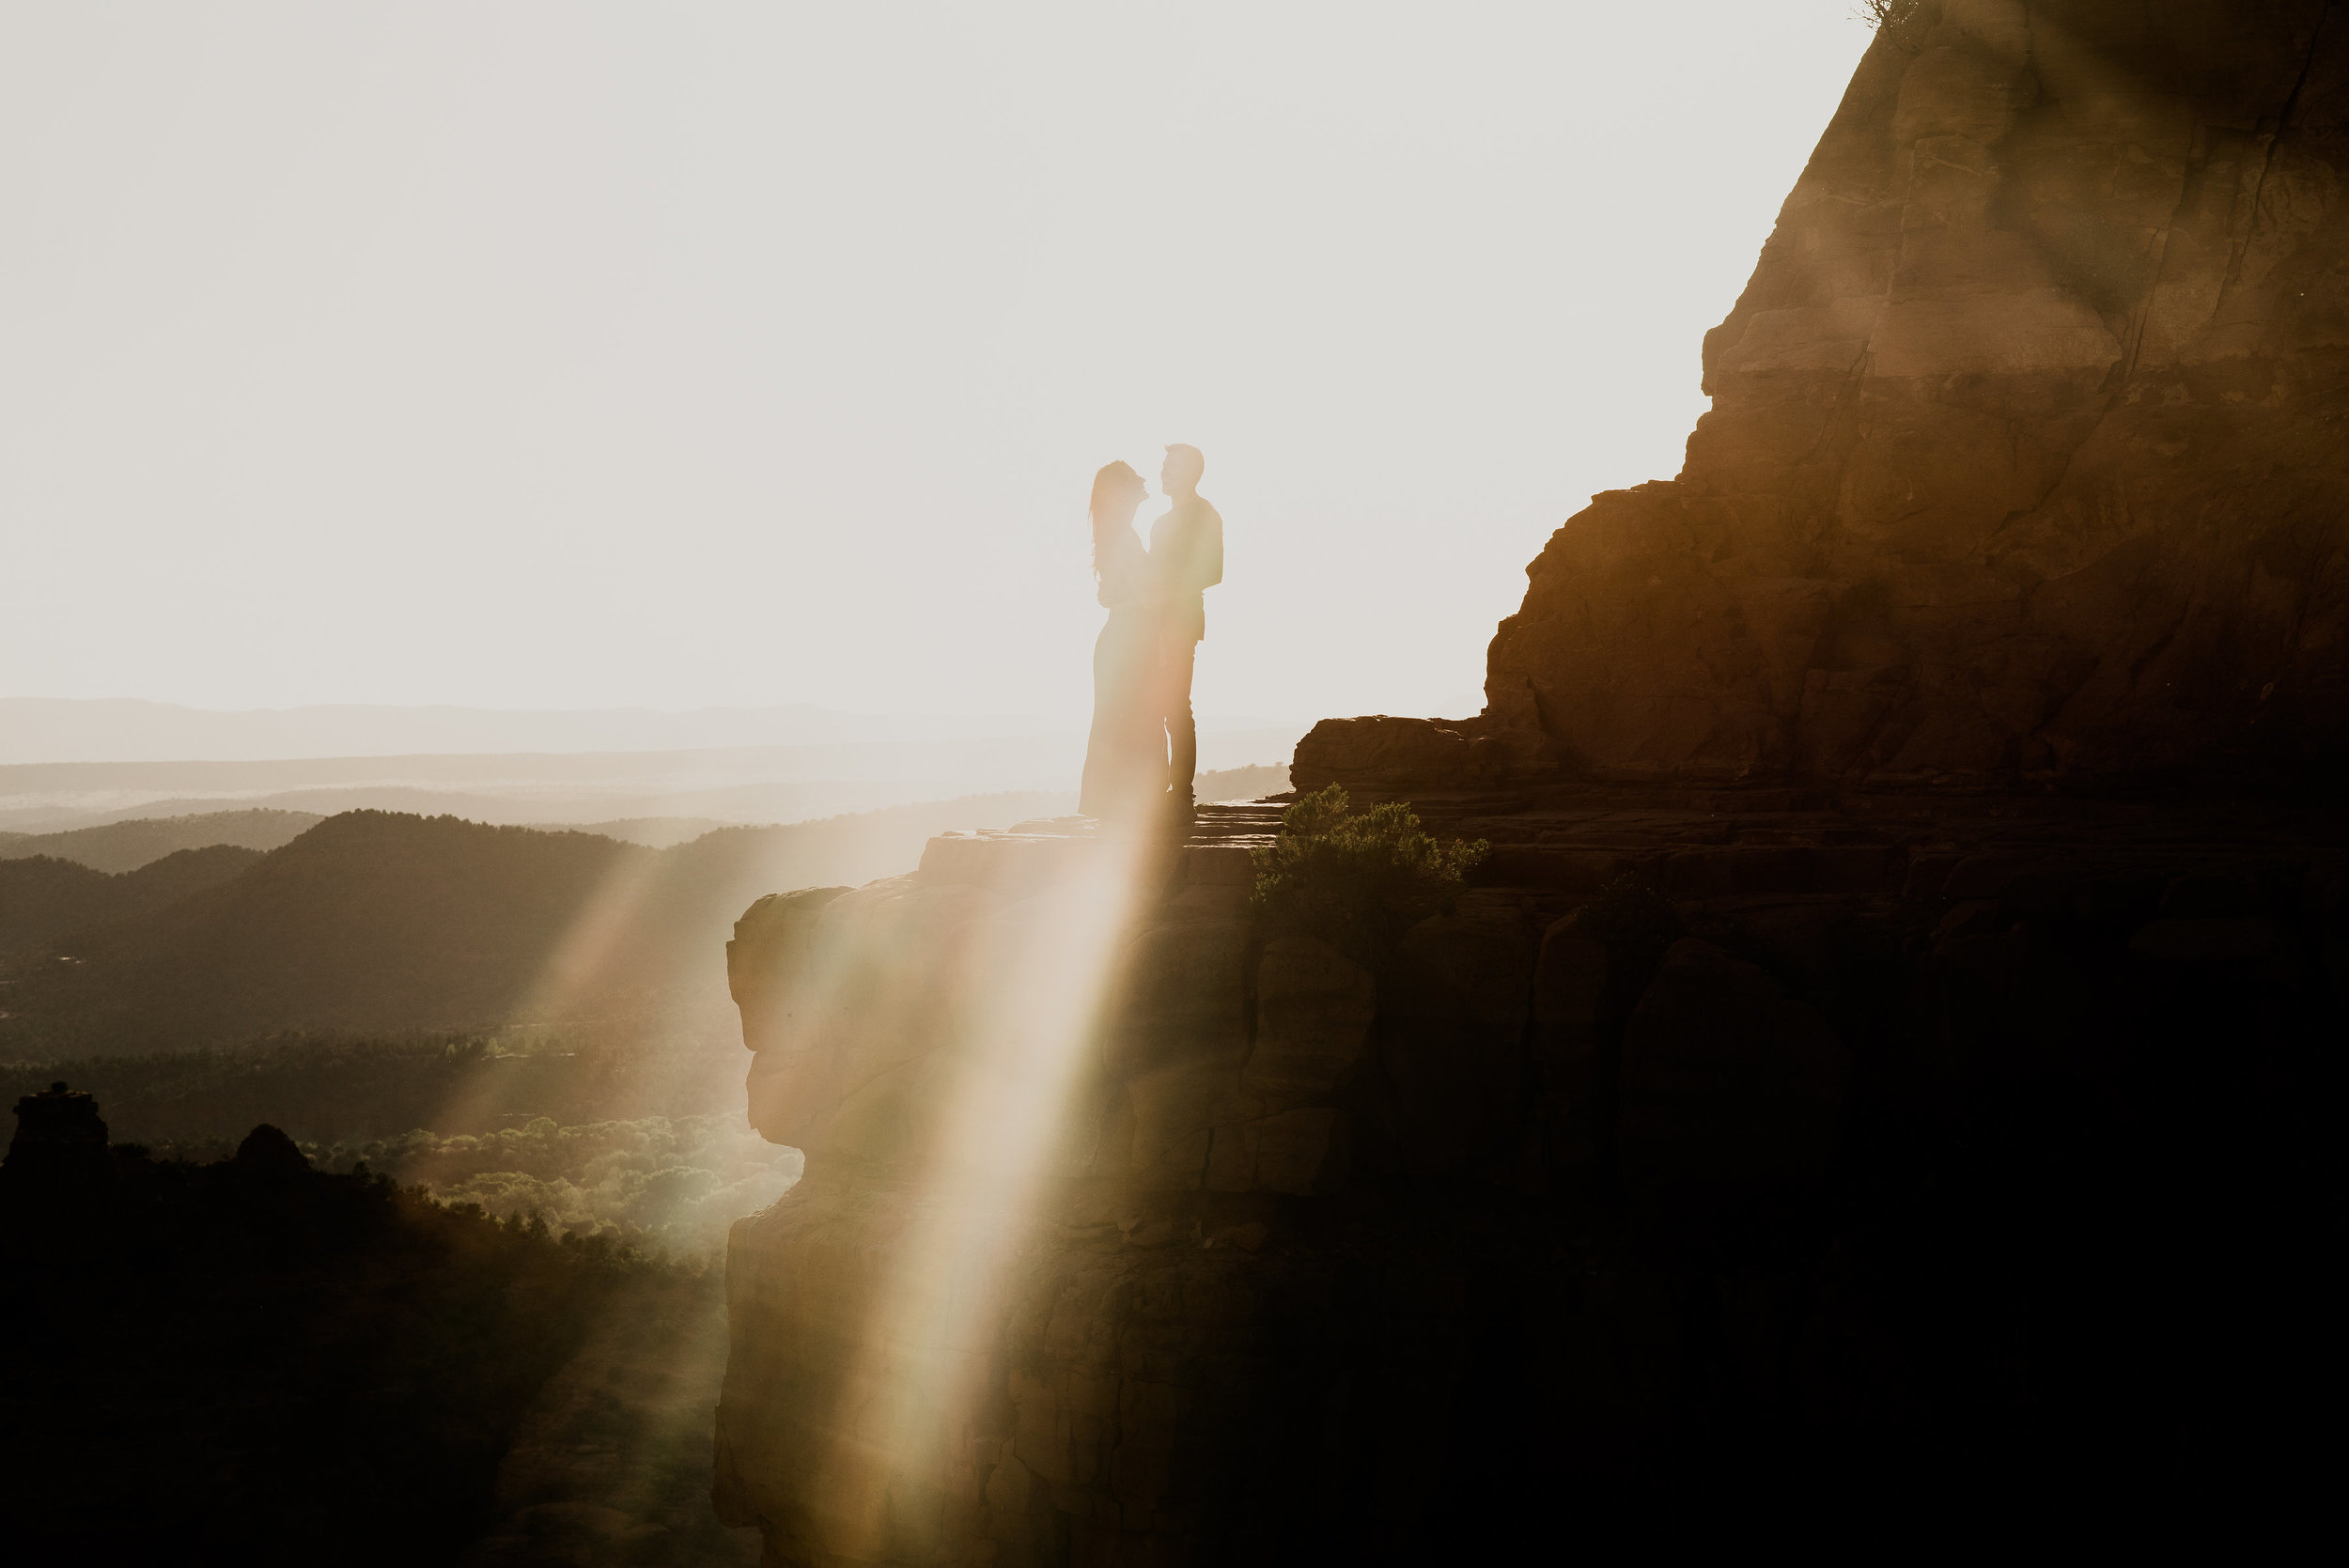 Isaiah-&-Taylor-Photography---Paul-&-Karen-Engagement,-Sedona-Arizona-080.jpg